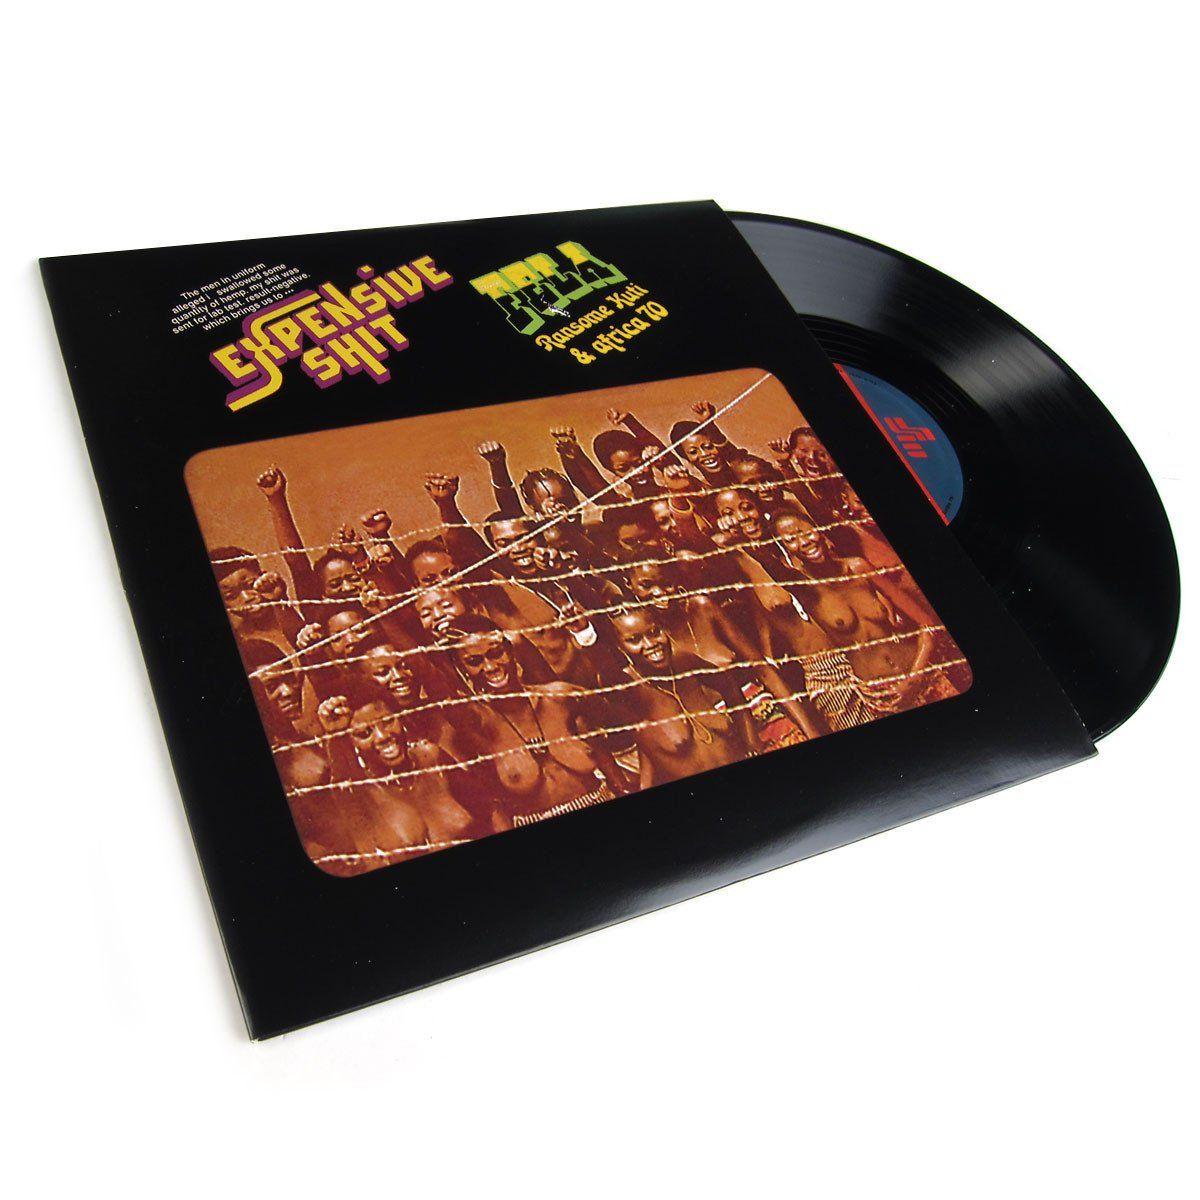 Fela Ransome Kuti Africa 70 Expensive Shit Free Mp3 Vinyl Lp Vinyl Mp3 Africa